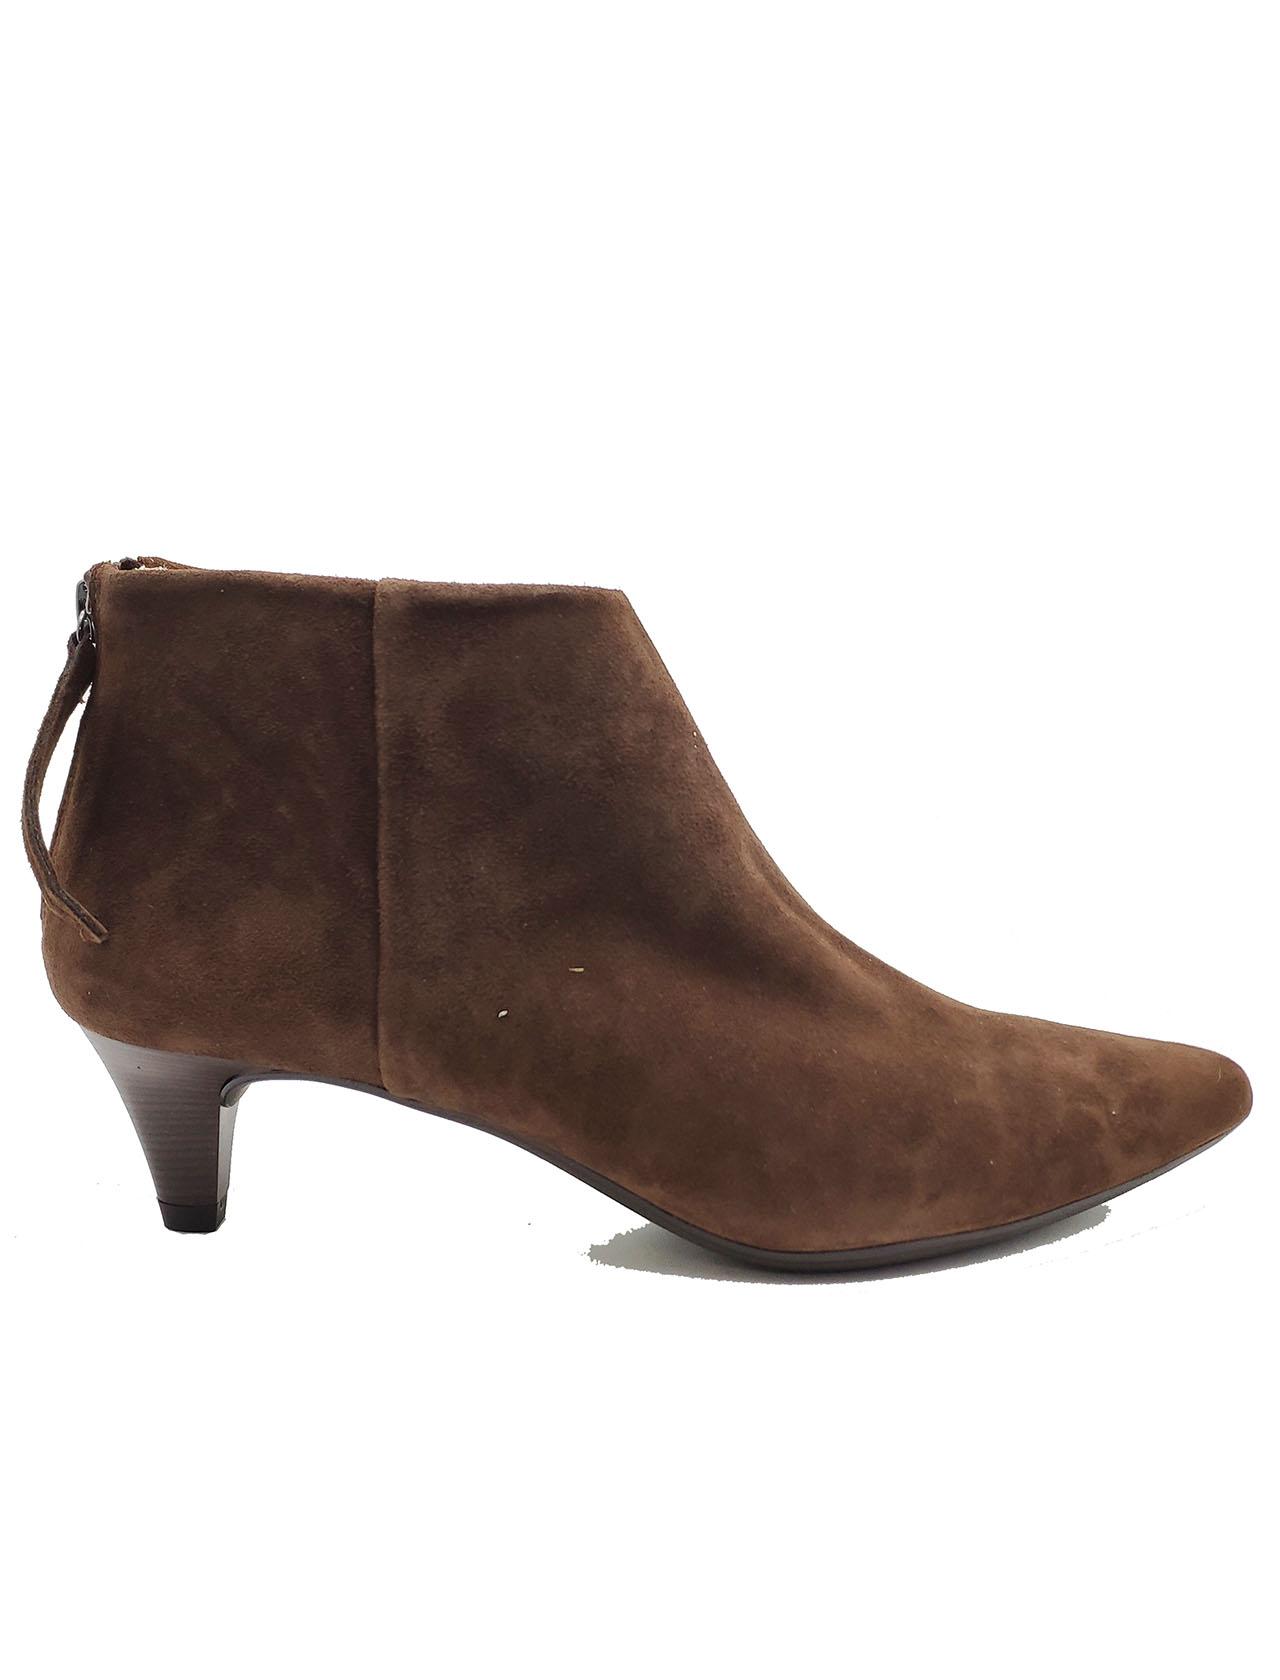 Unisa   Ankle Boots   JUDITMORO